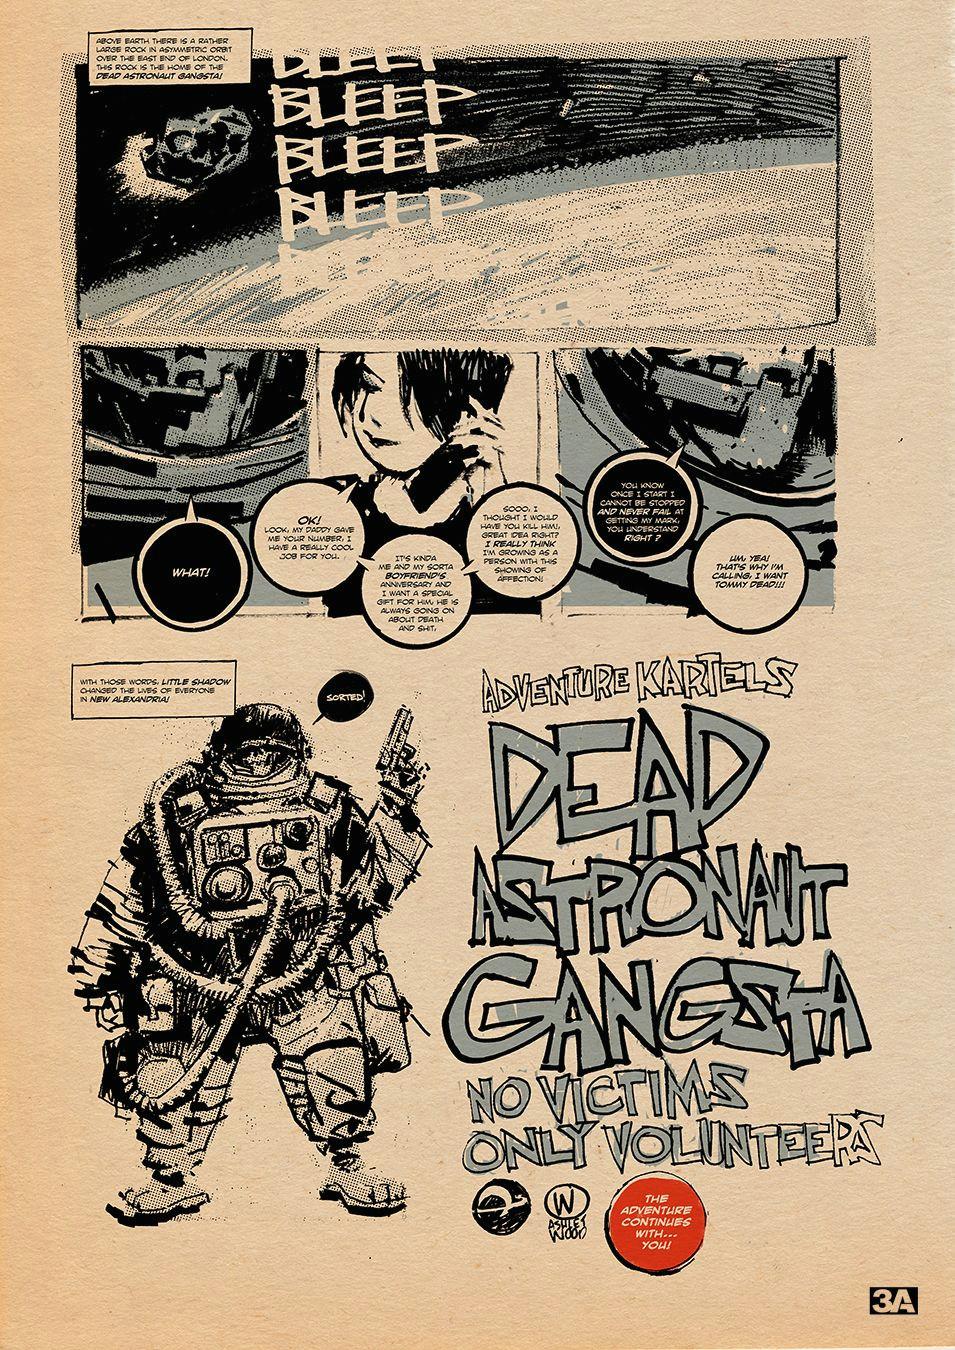 dead astronaut gangsta comic